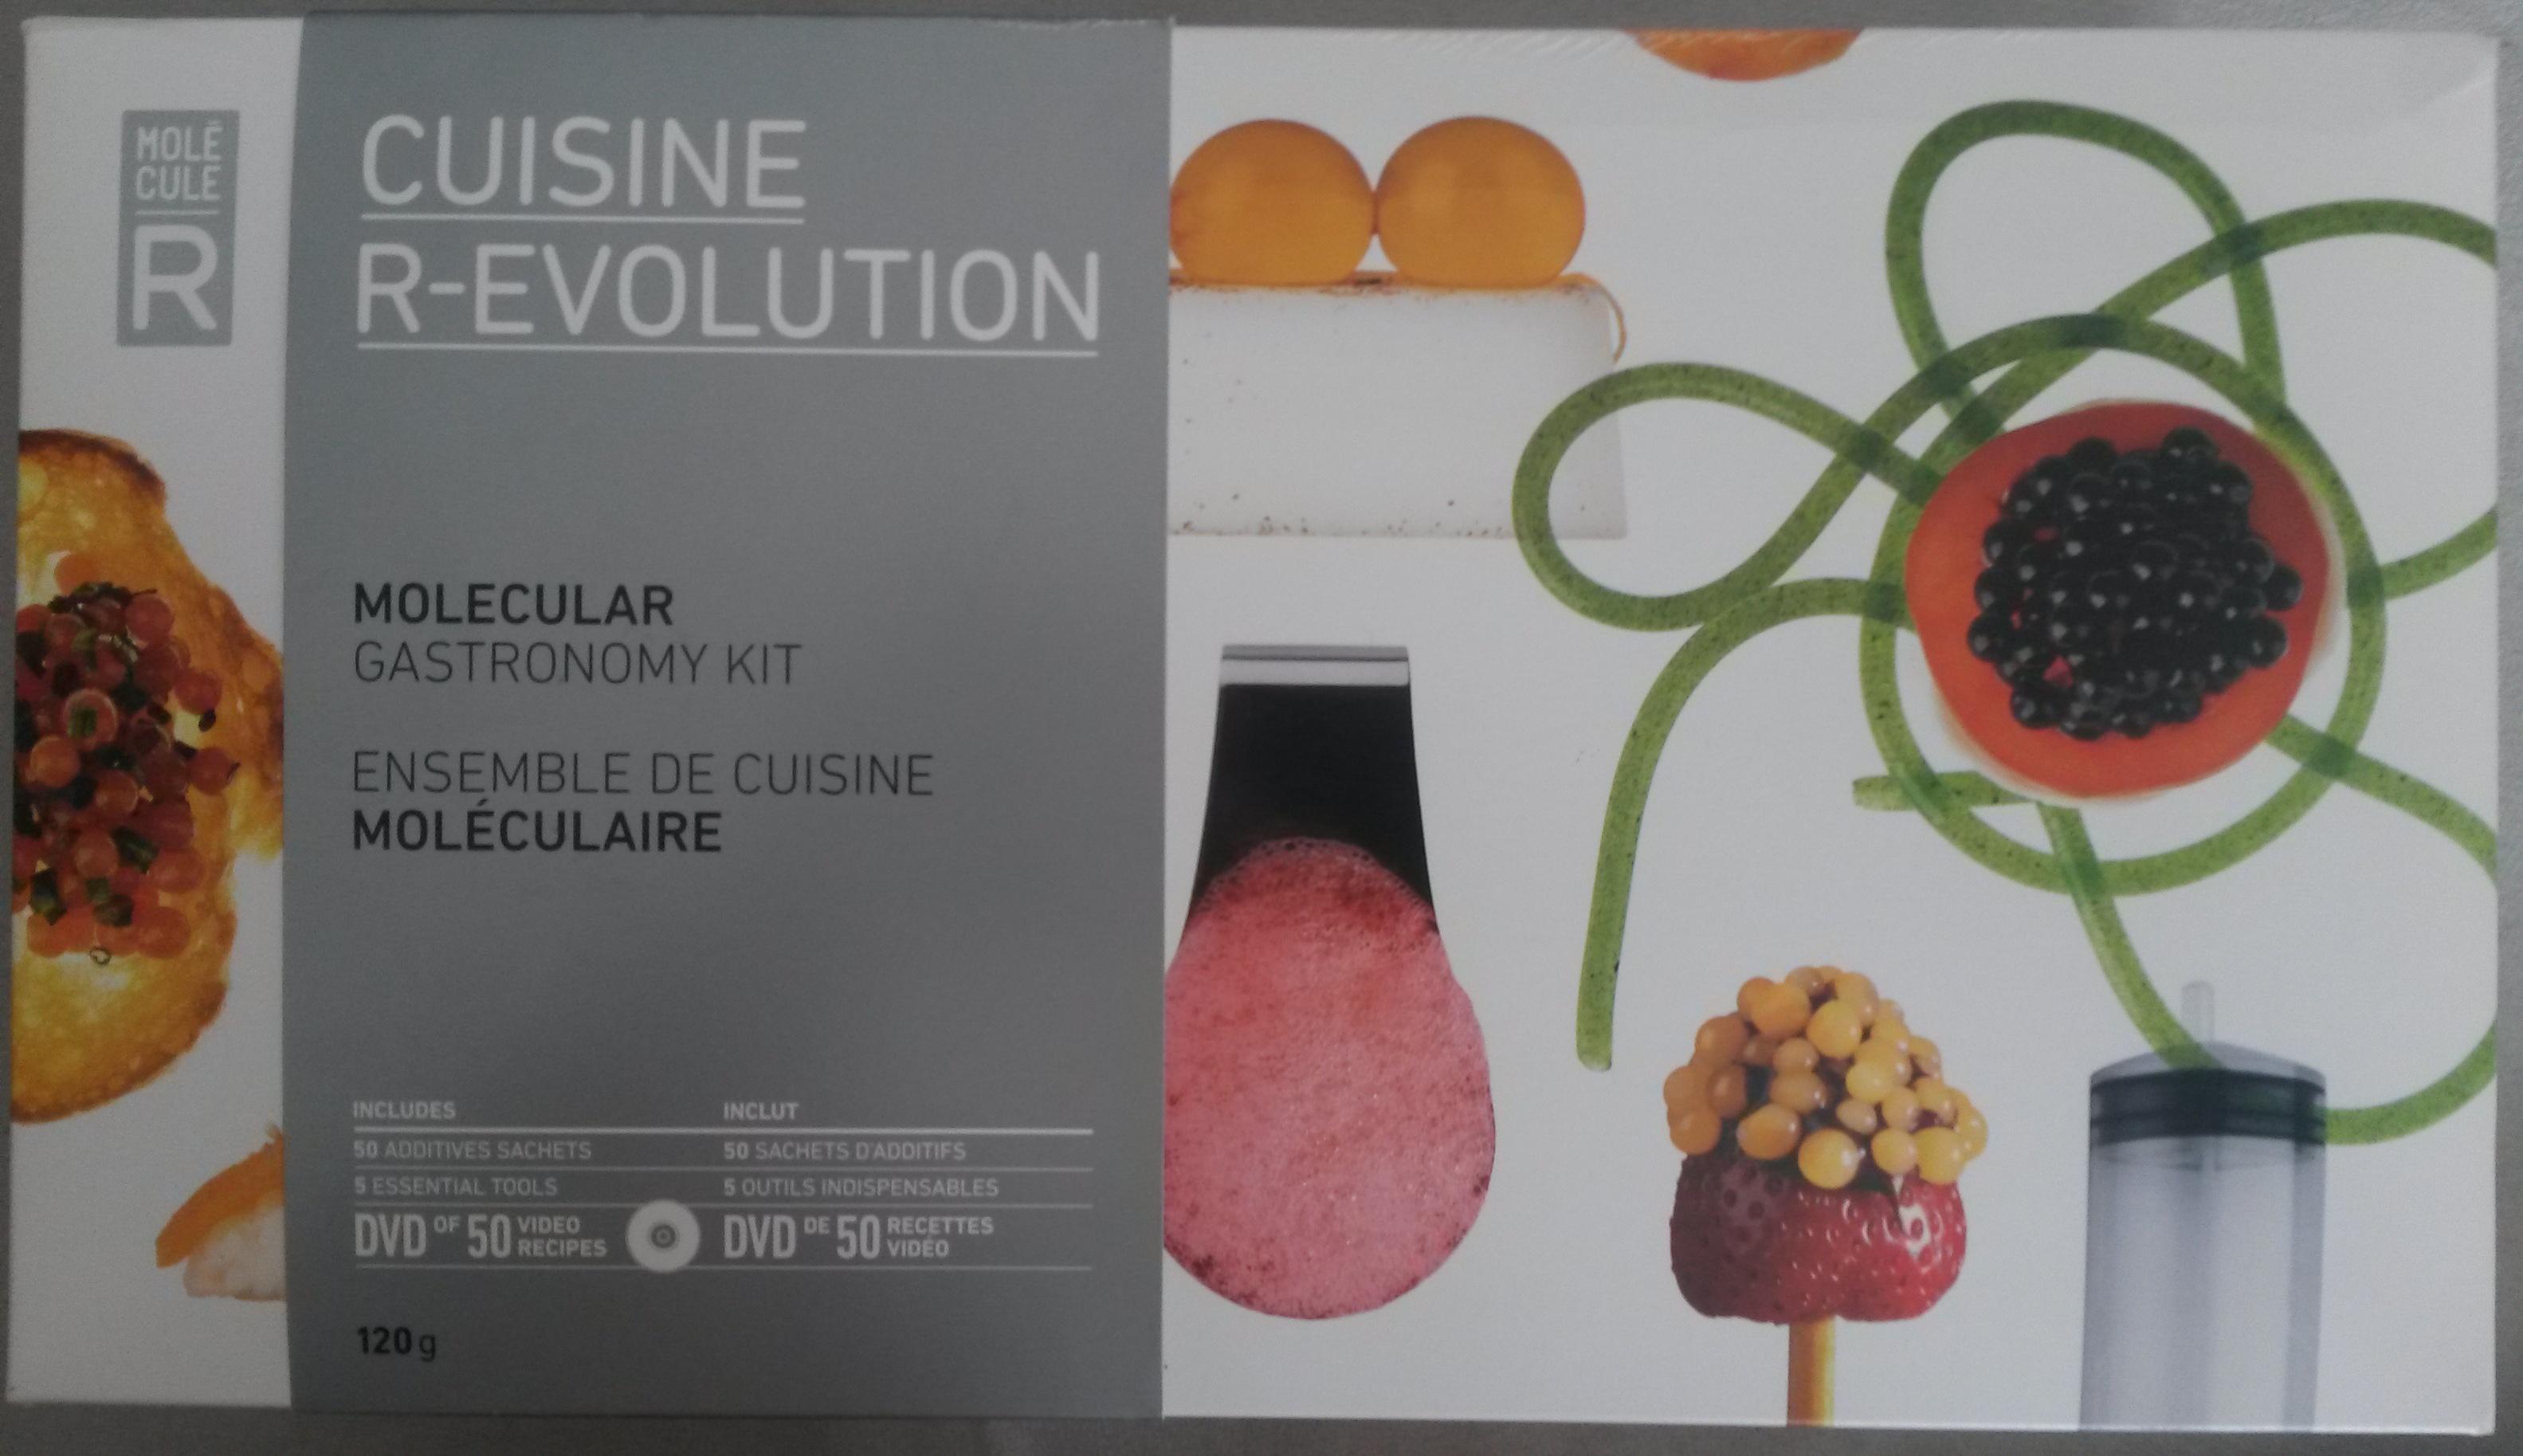 Cuisine r evolution mol cule r 120 g for Cuisine r evolution